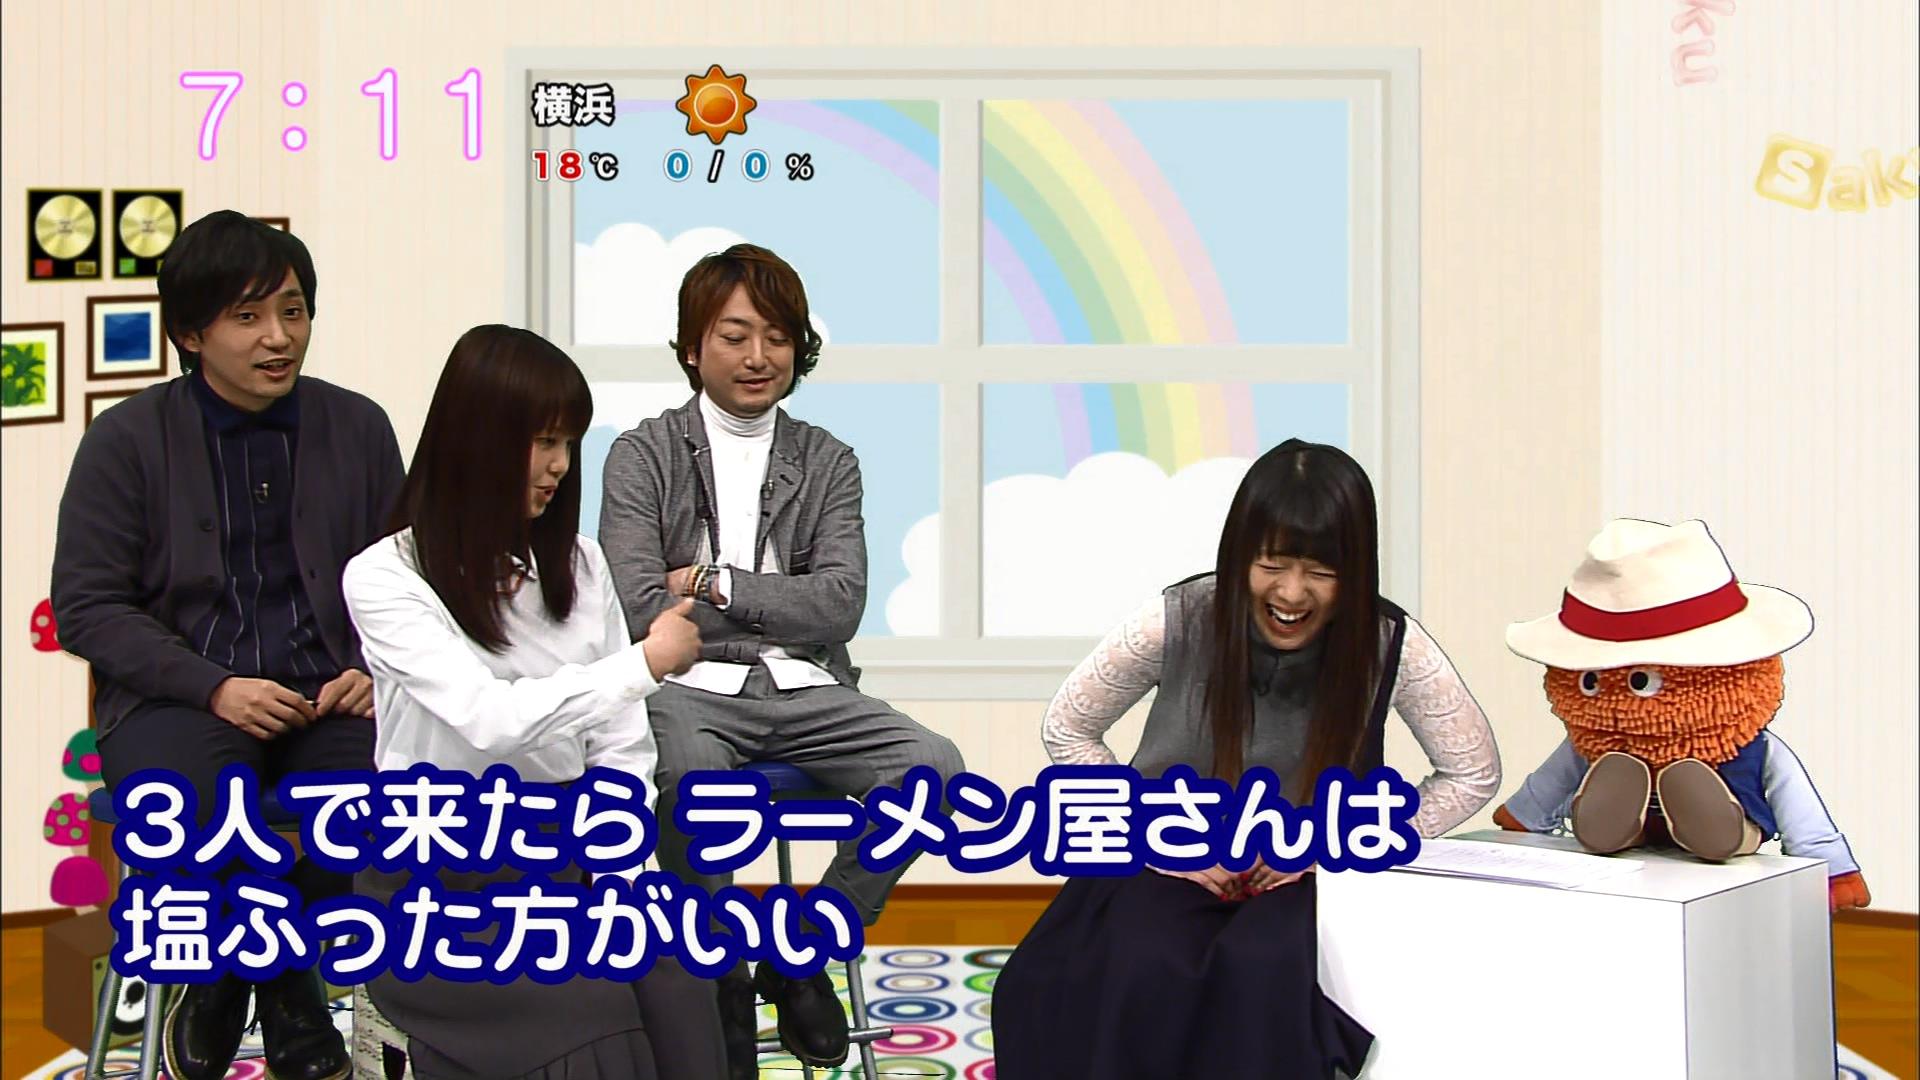 2016.03.17 いきものがかり(saku saku).ts_20160317_081039.723